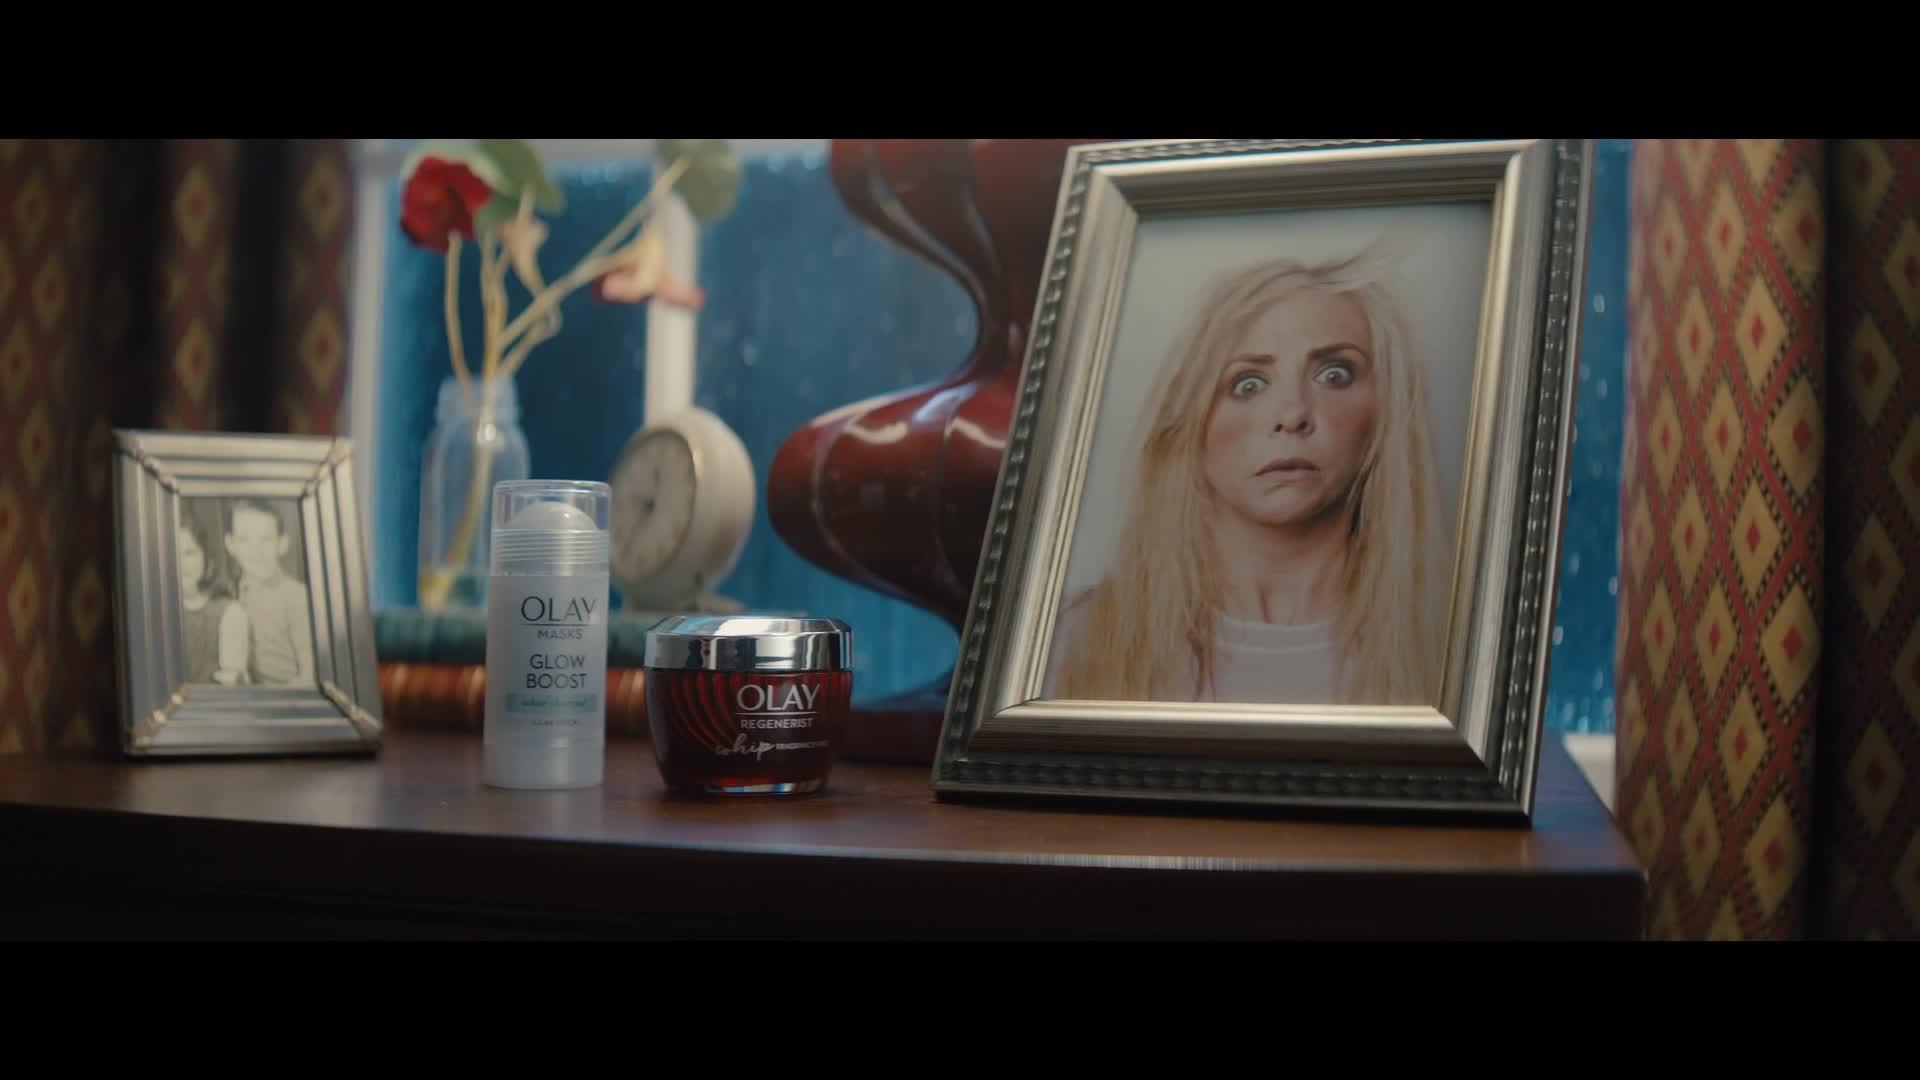 Werbespot, Super Bowl, Gesichtserkennung, Face ID, Super Bowl 2019